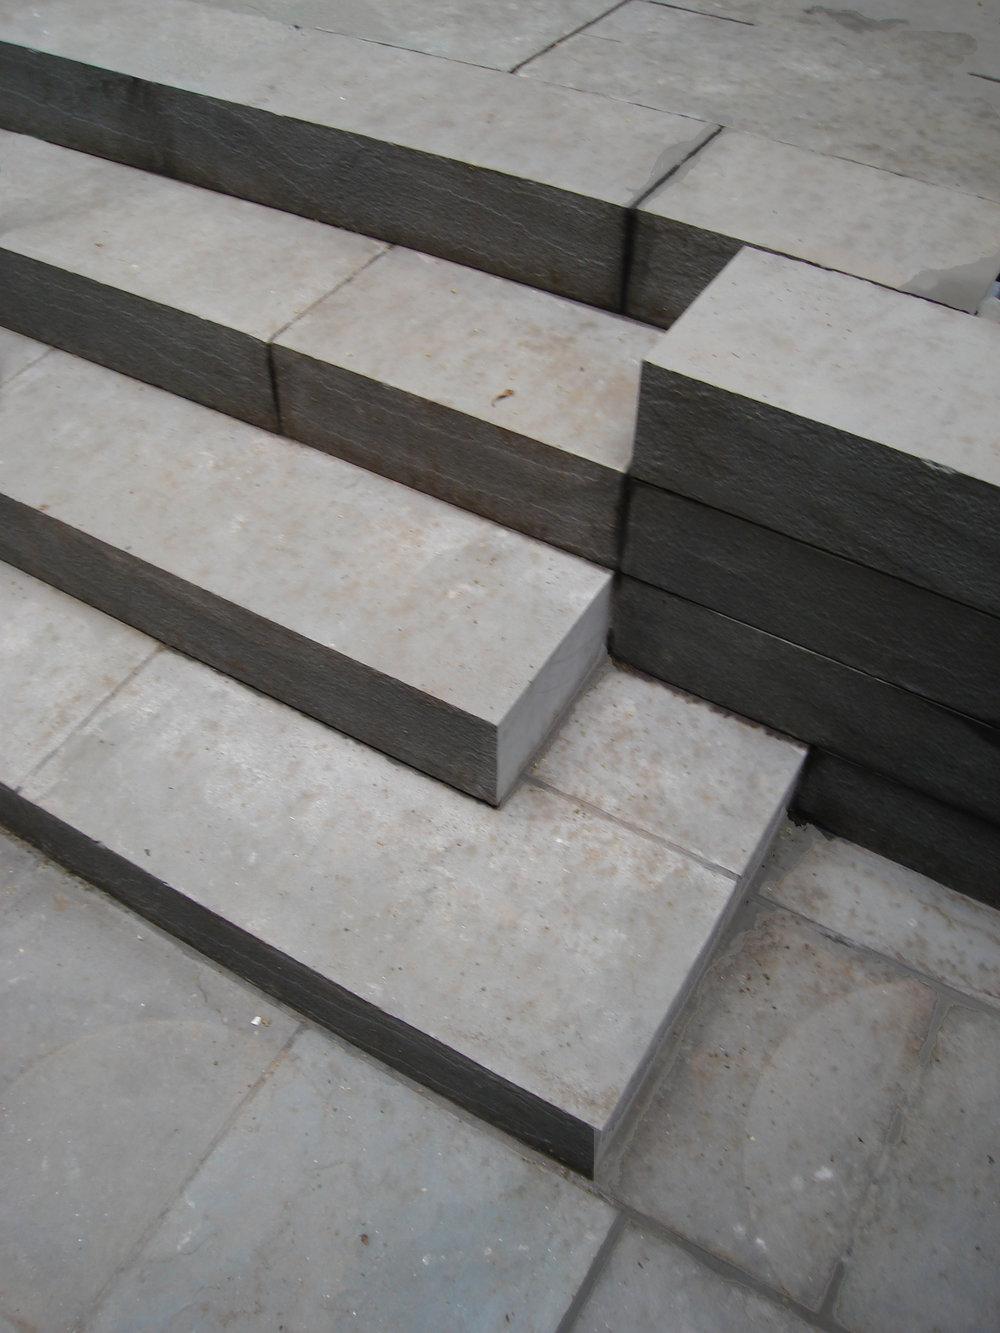 midtown garden concrete steps